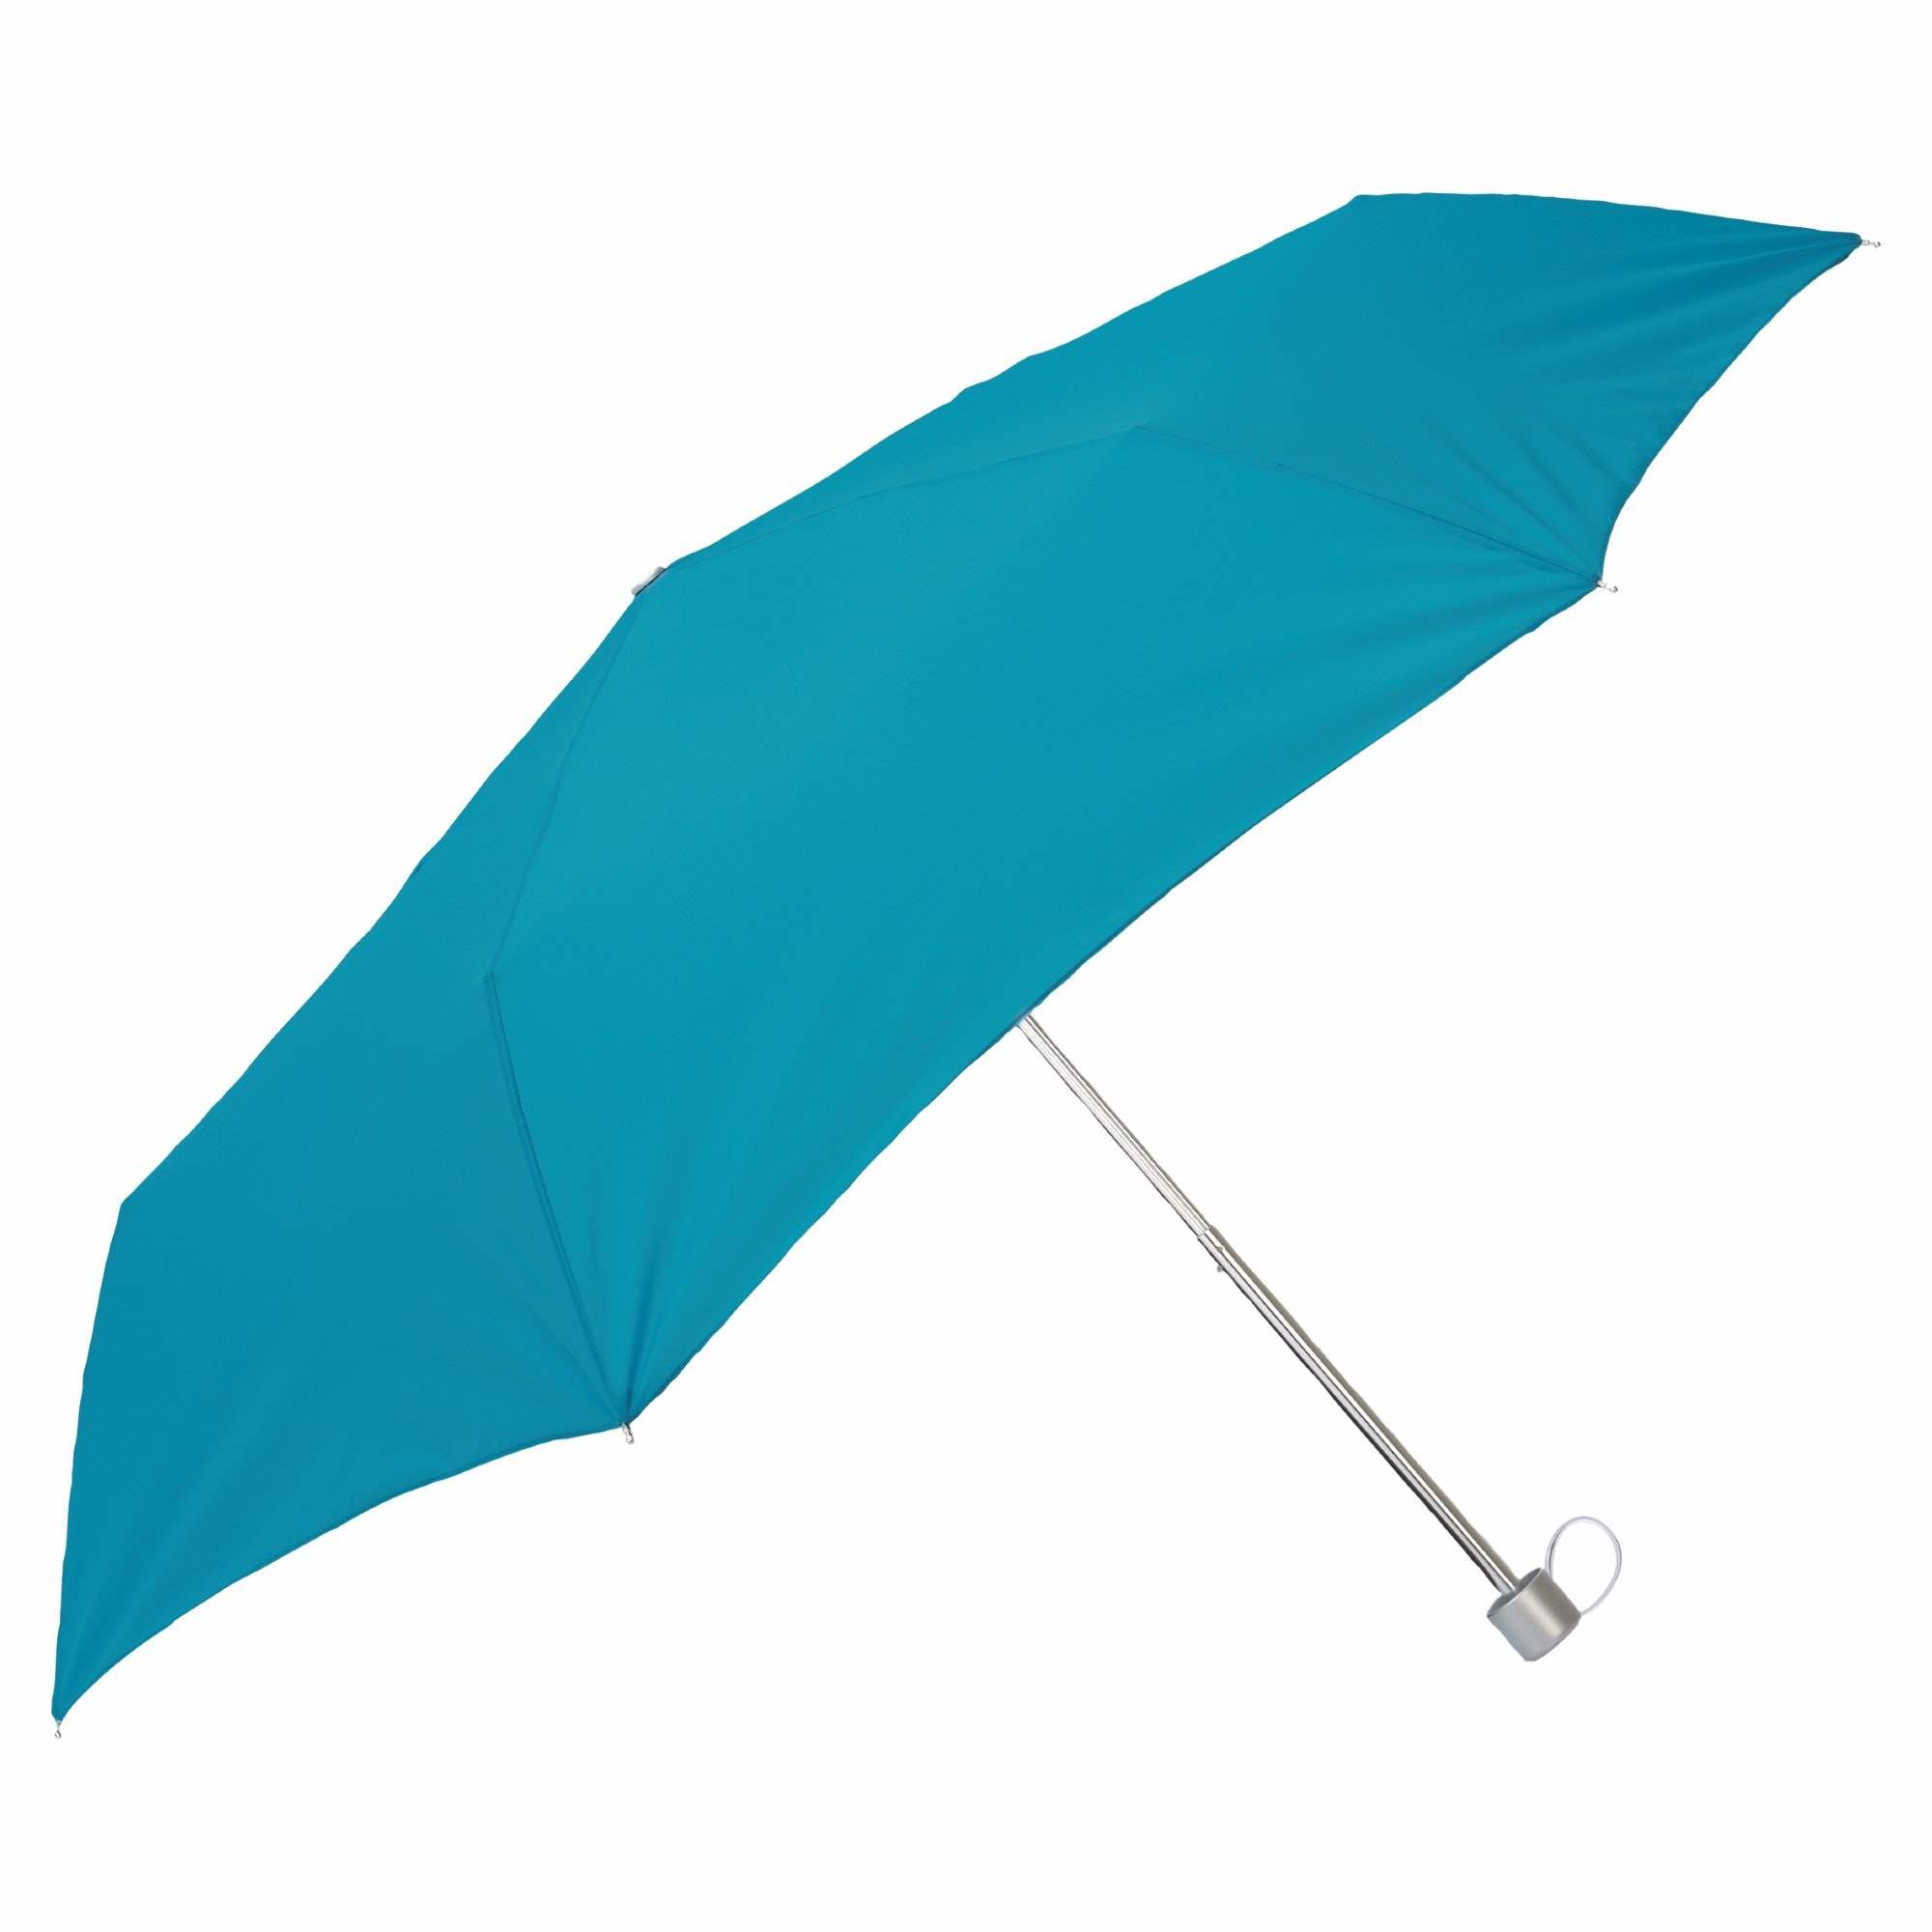 Davek Elite Umbrella | Best Windproof Umbrella | Luxury Rain ...